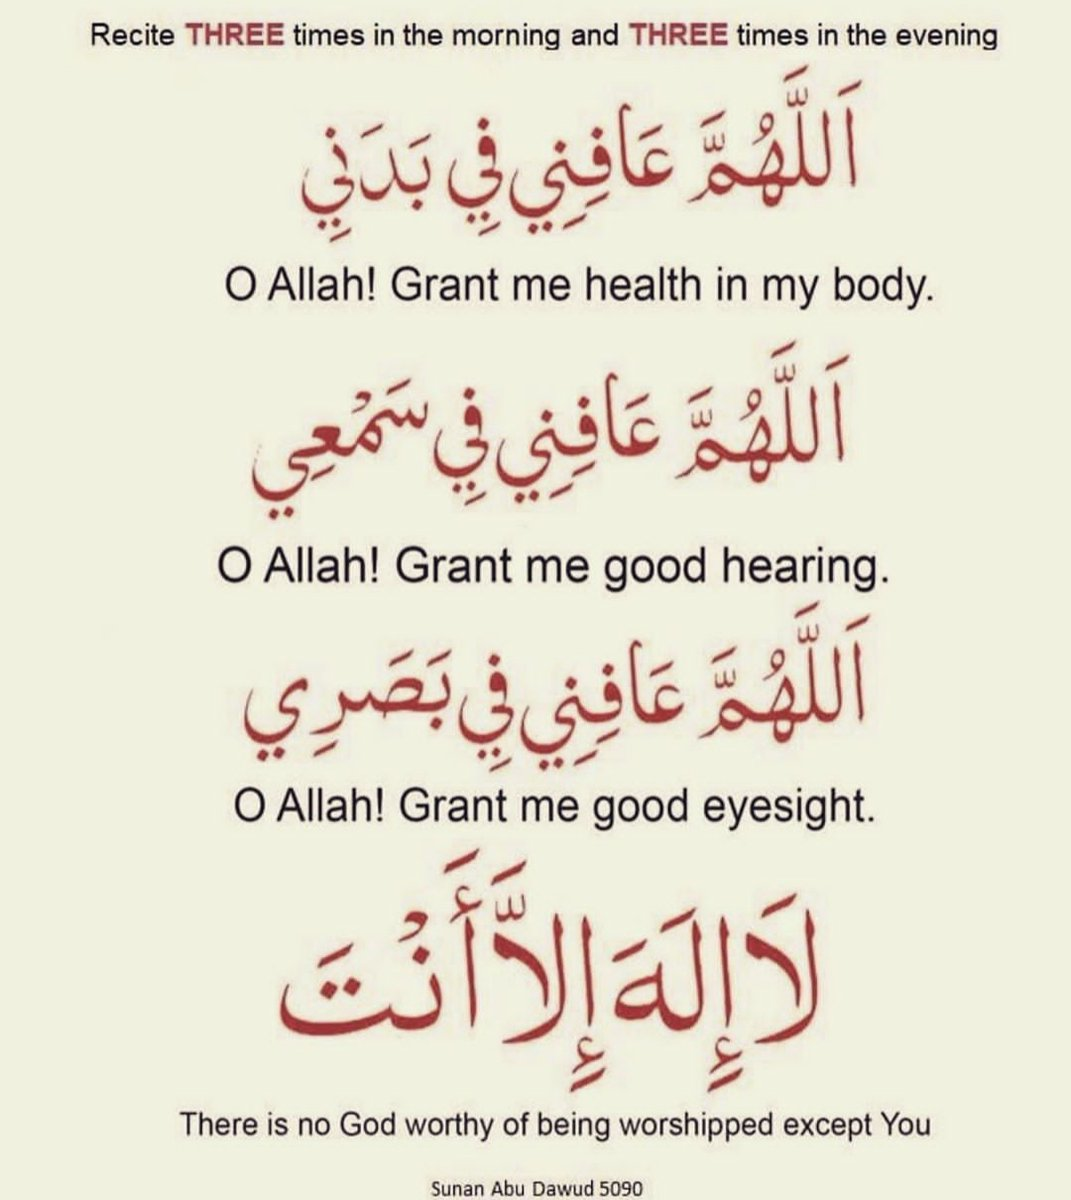 #dua #prayer #radioislam #muslim #allahumma #ameen